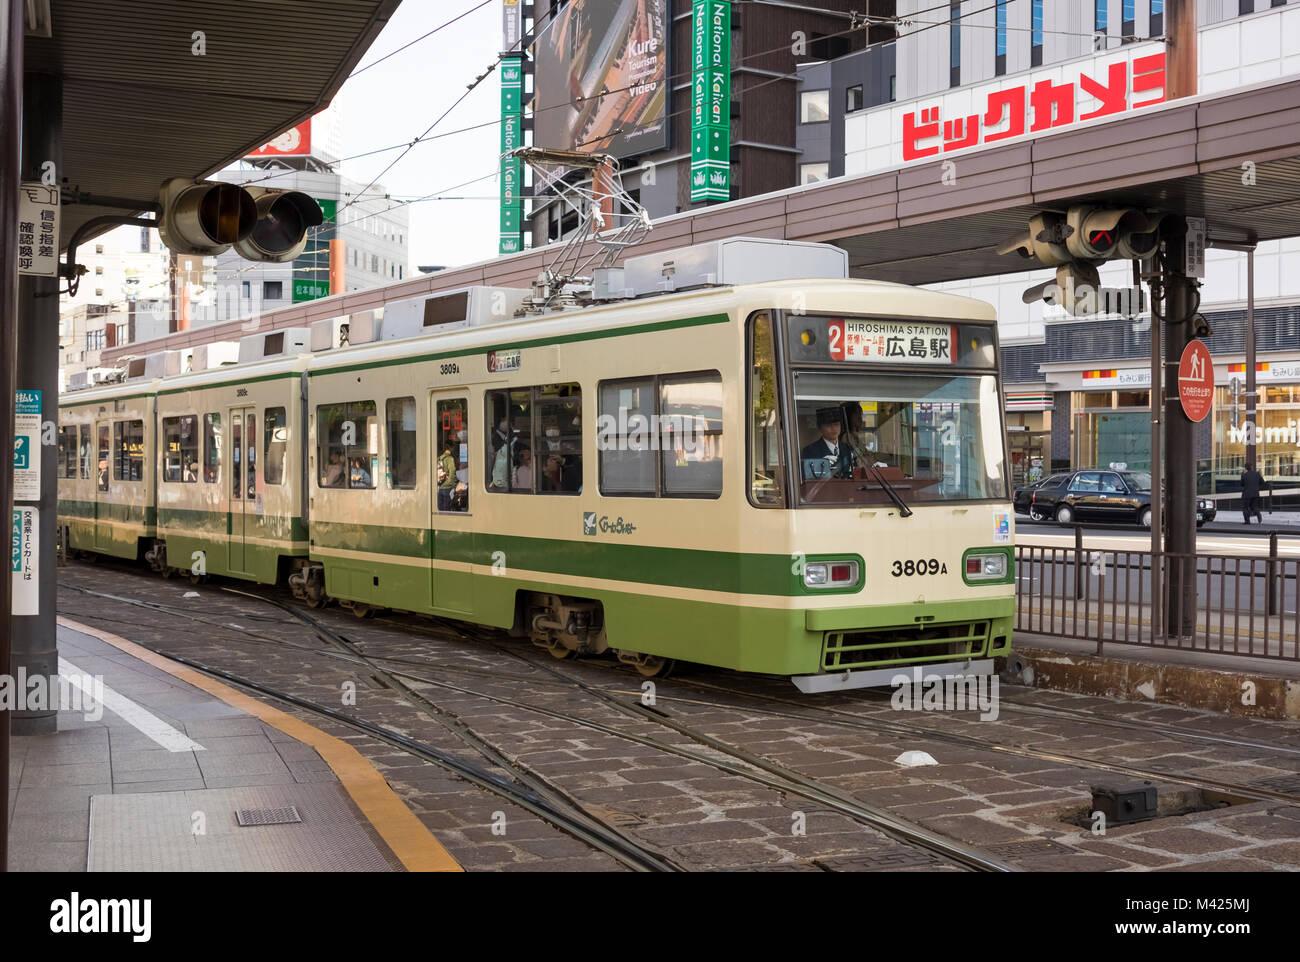 Tram in the street in Hiroshima, Japan - Stock Image